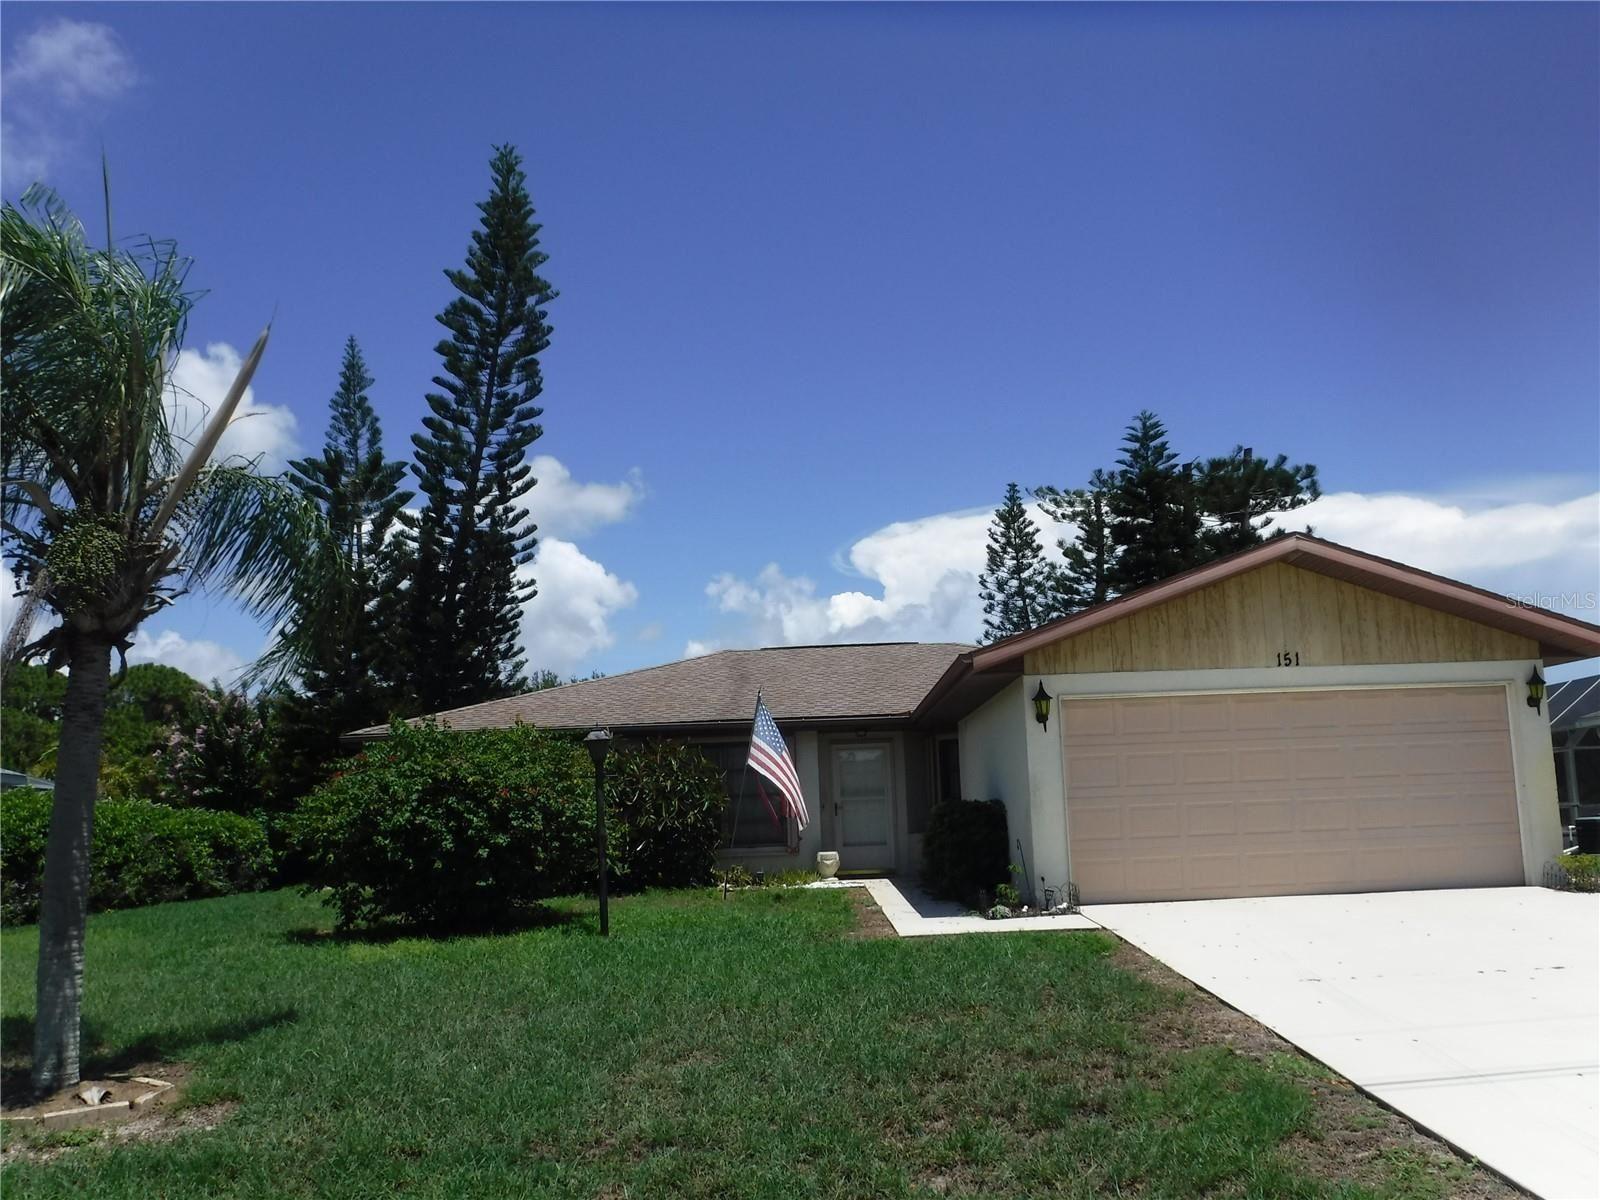 Photo of 151 MARK TWAIN LANE, ROTONDA WEST, FL 33947 (MLS # D6120219)